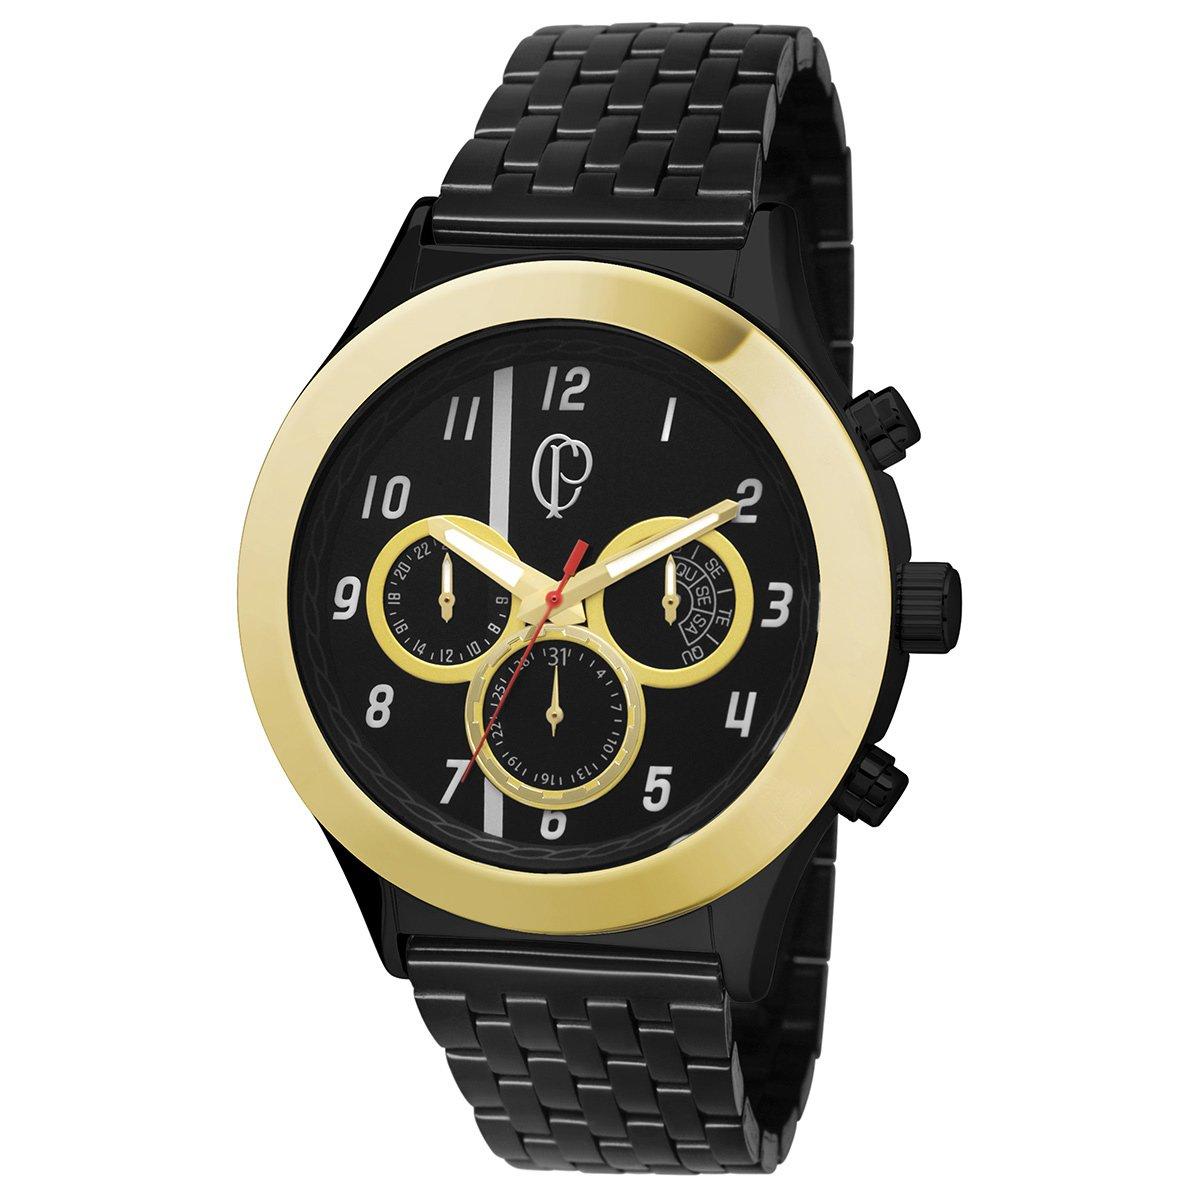 d34405ad747a2 Relógio Corinthians Technos Metal Analógico Cronógrafo - Compre Agora